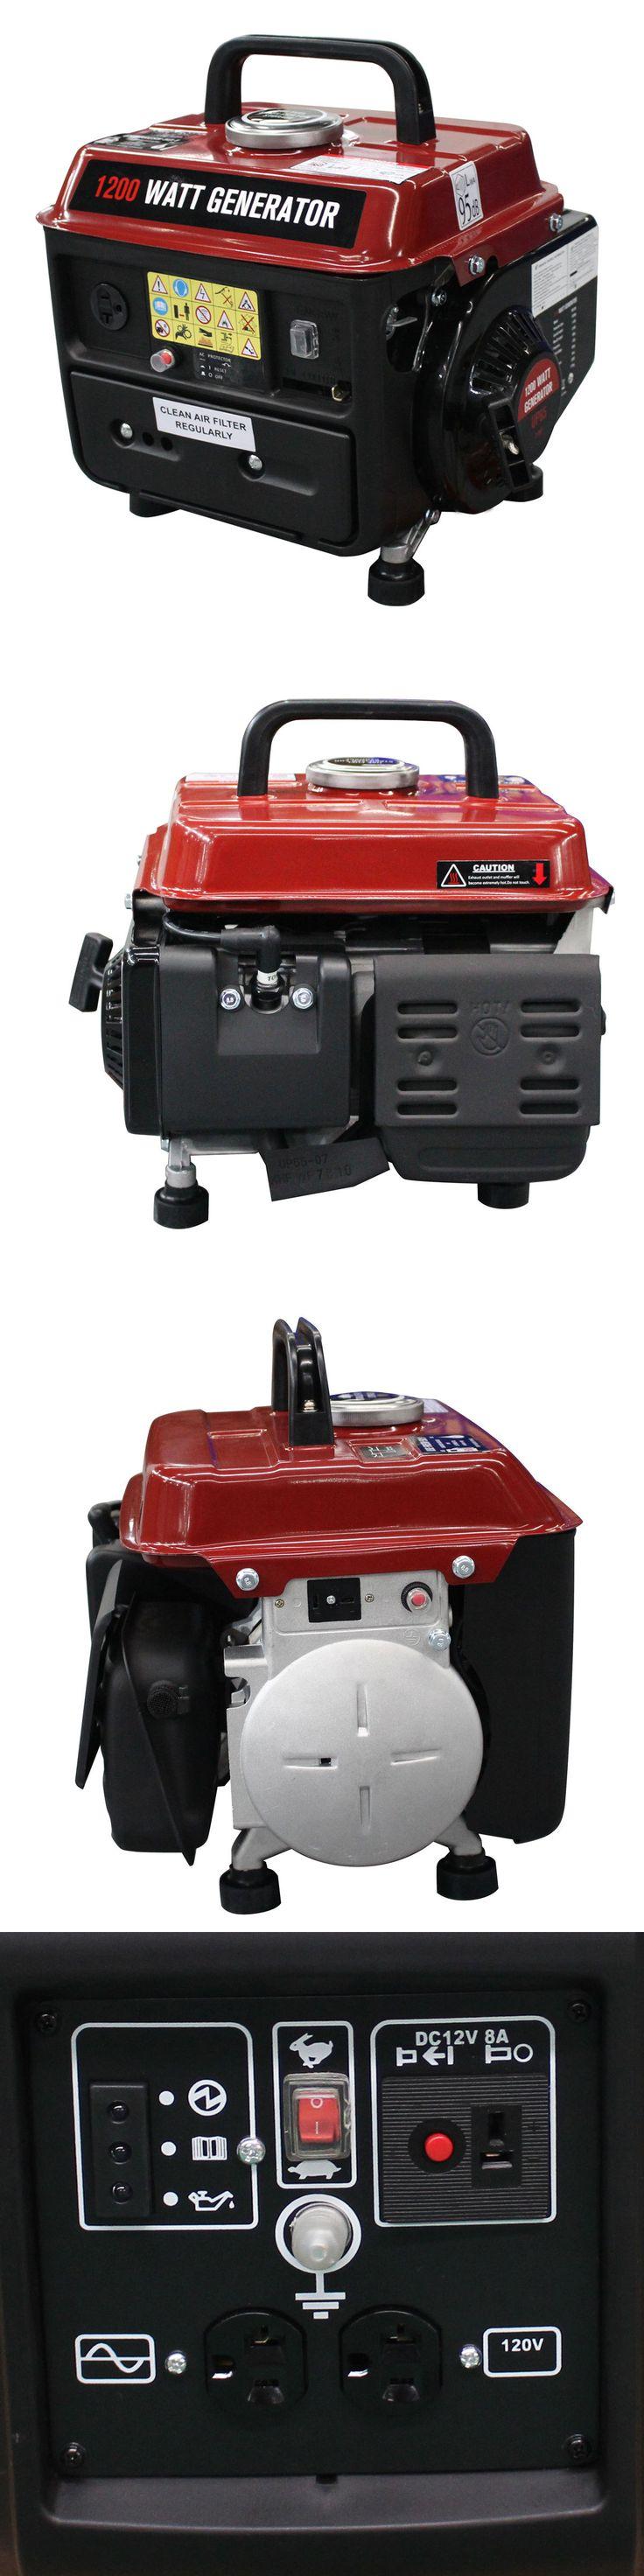 Generators 33082: 1200W Gasoline Generator 2 Stroke 63Cc Single Cylinder Gas Powered Portable Epa -> BUY IT NOW ONLY: $99.95 on eBay!